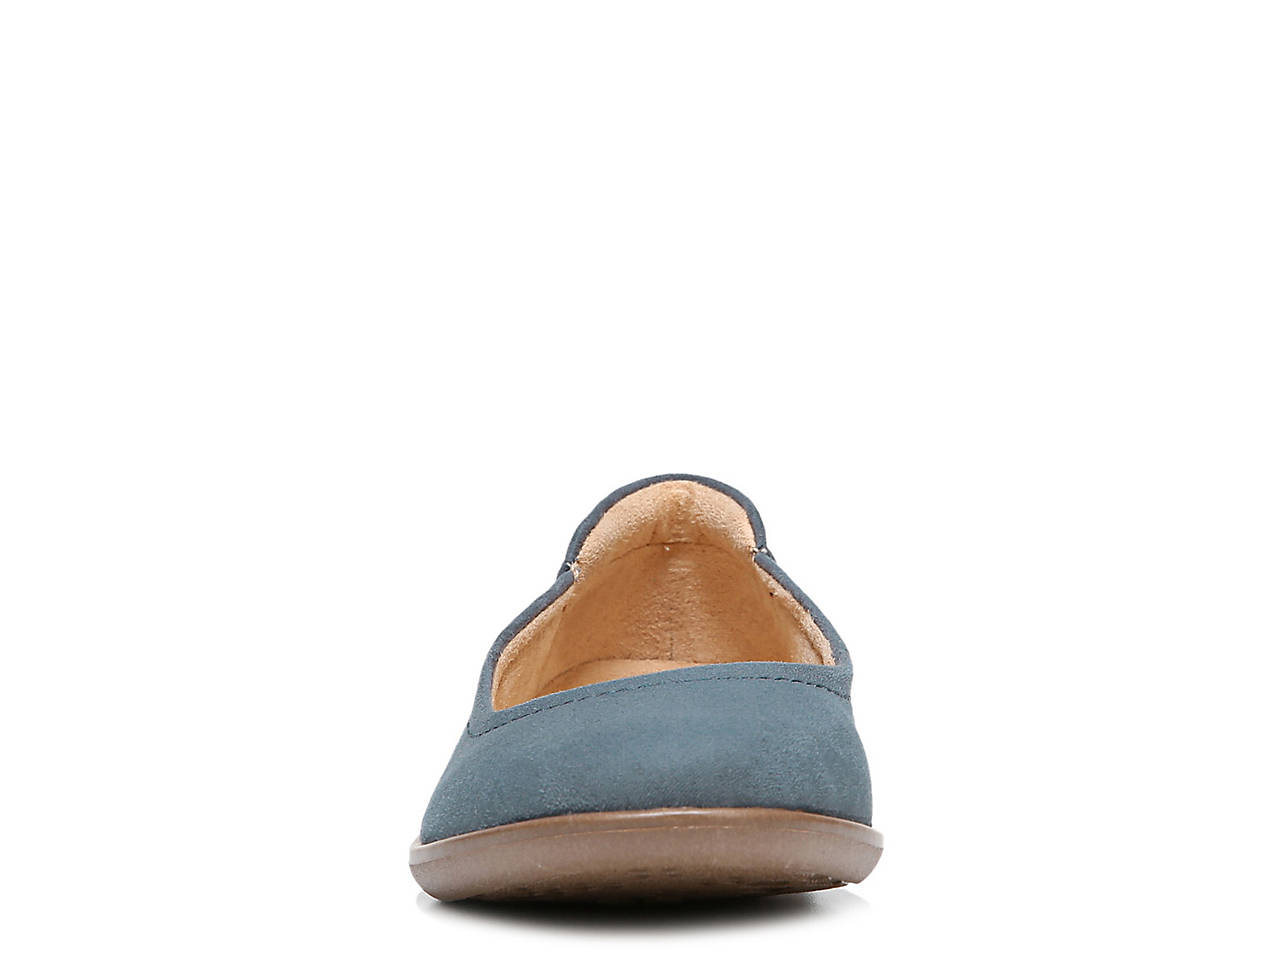 825ae96887 Naturalizer Flexy Ballet Flat Women's Shoes   DSW